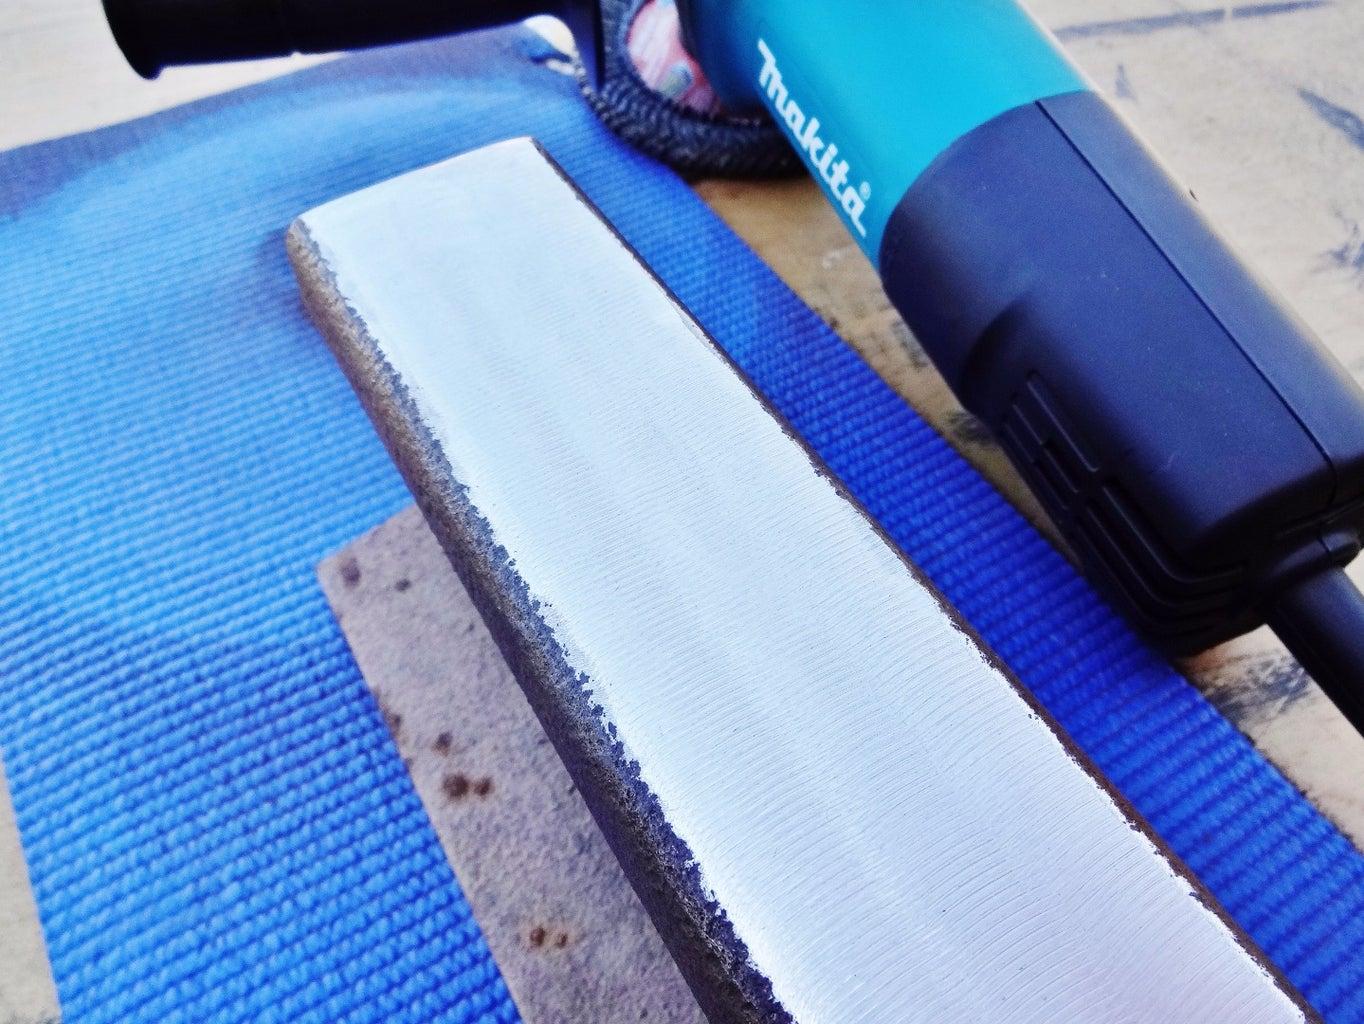 Flatten Top, Part Two: Hand-machining!